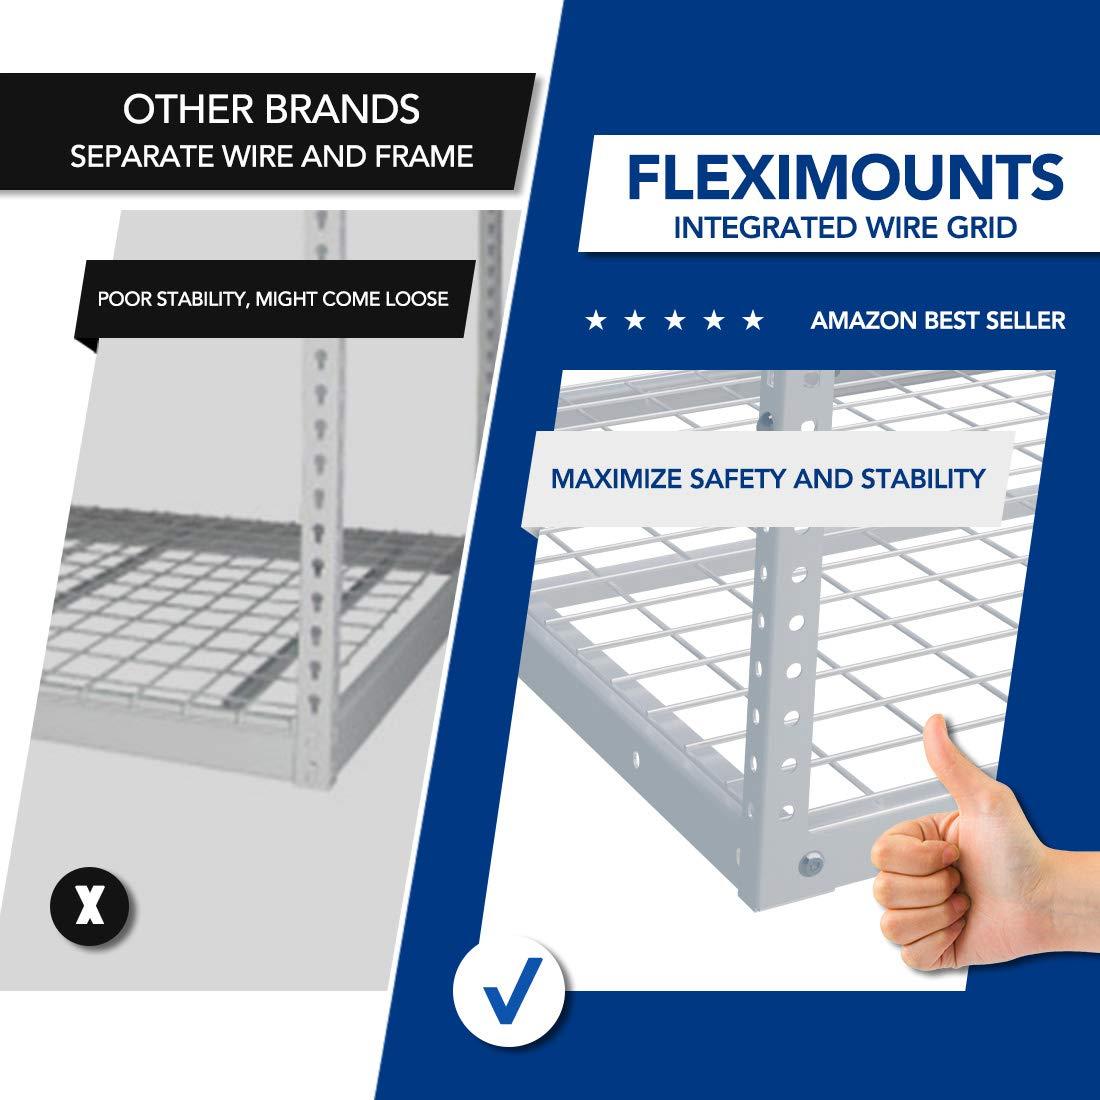 Fleximounts vs Saferacks: Design